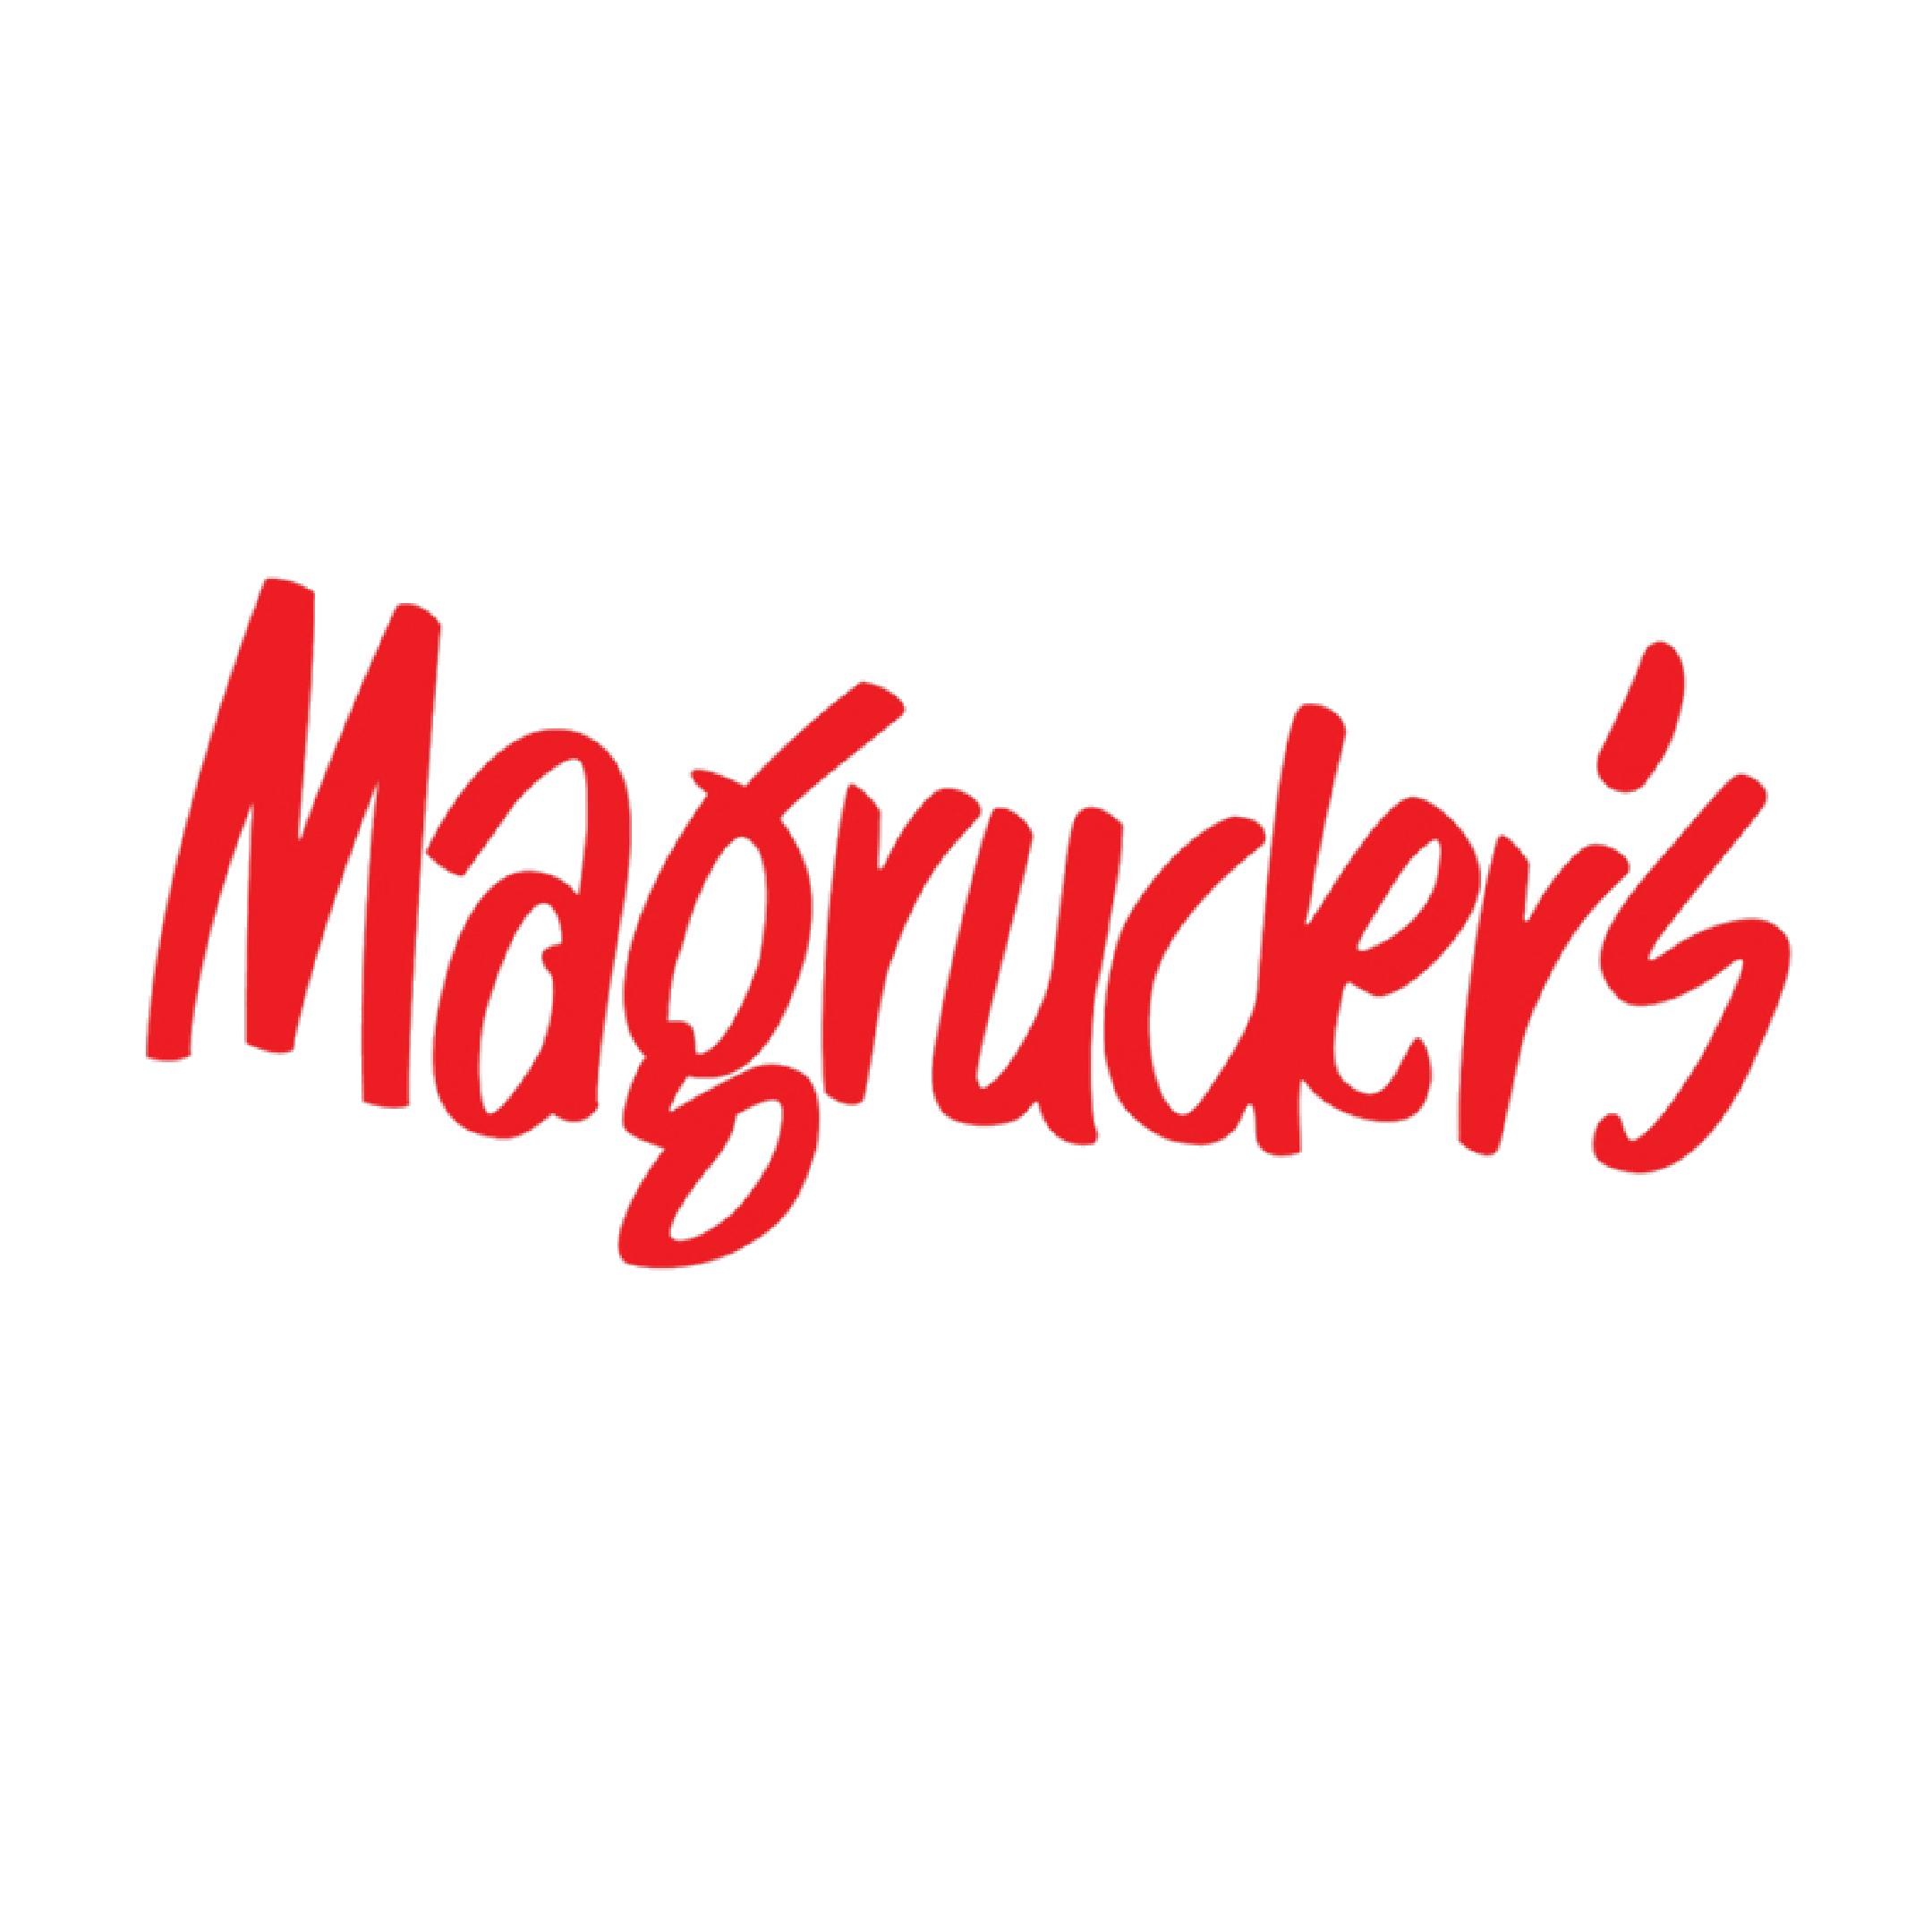 macgruders-01.png